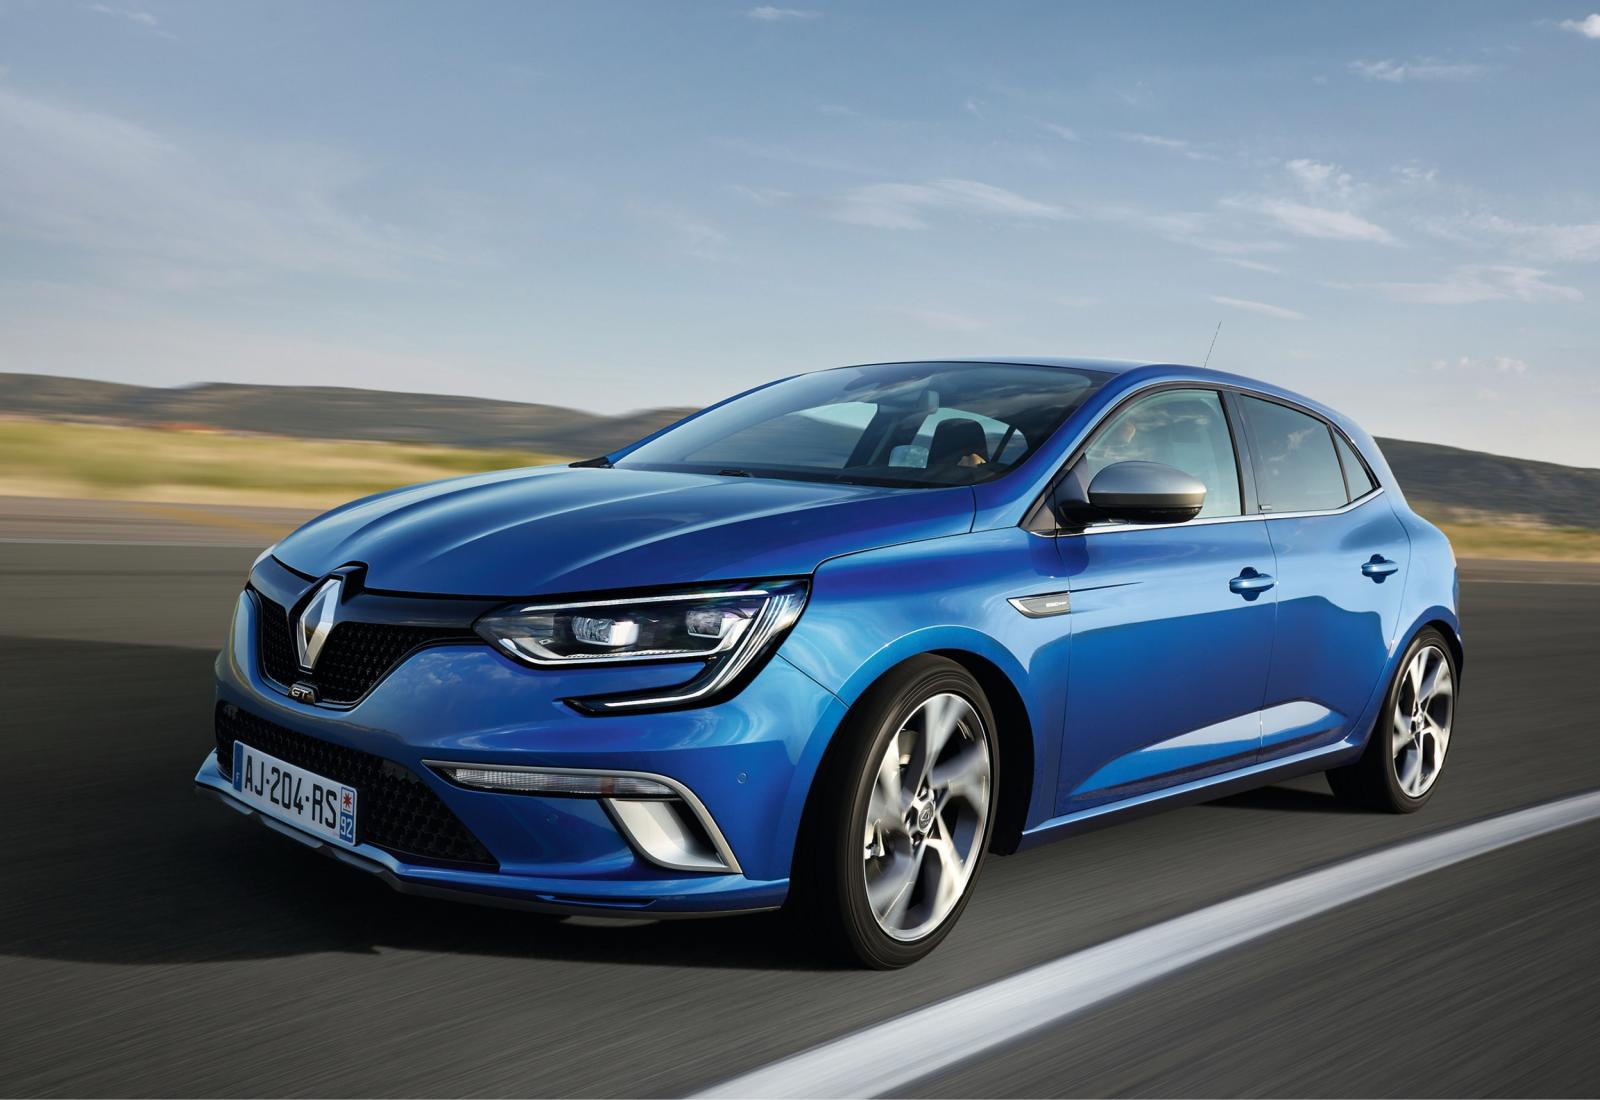 Satılık 2016 model Renault Megane